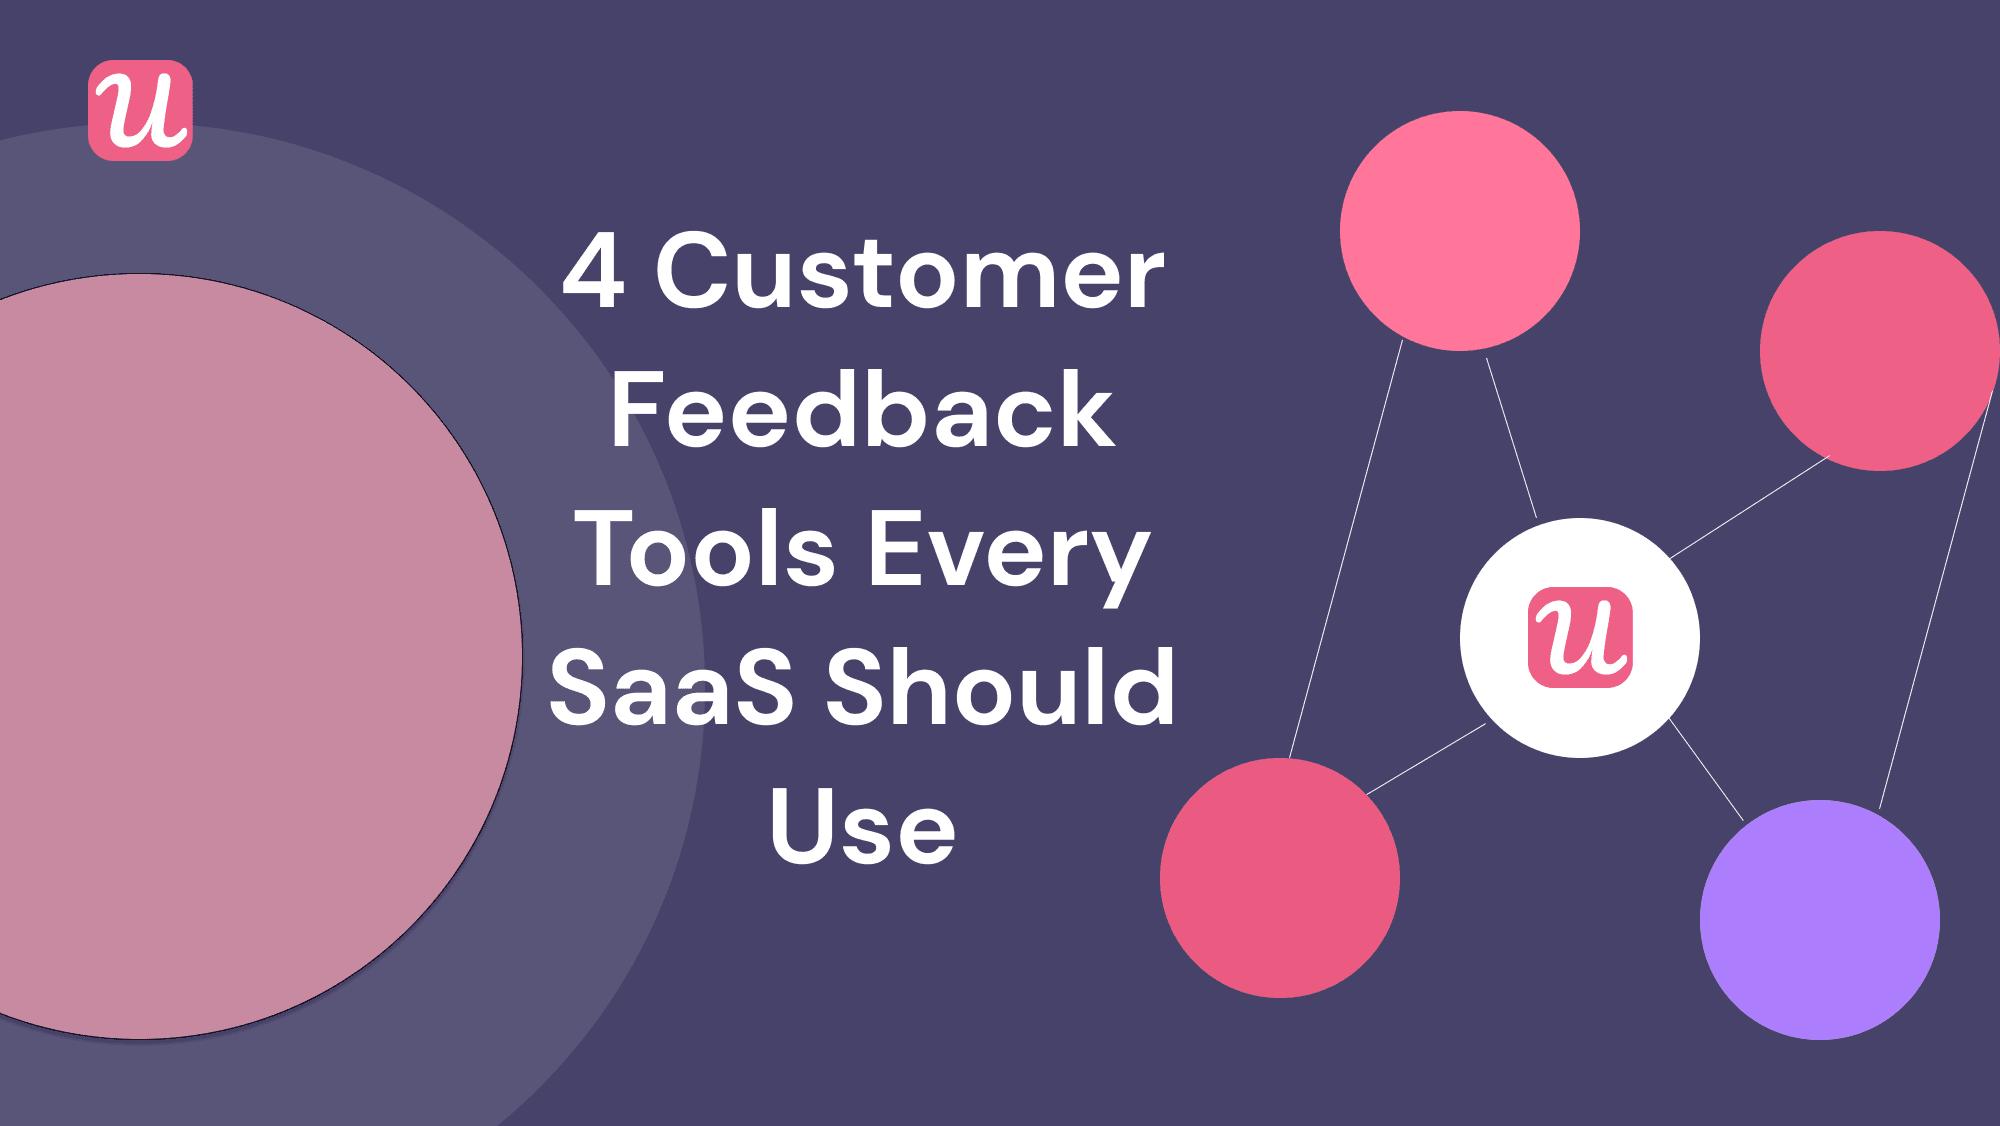 The 4 Customer Feedback Tools Every SaaS Company Should Be Using